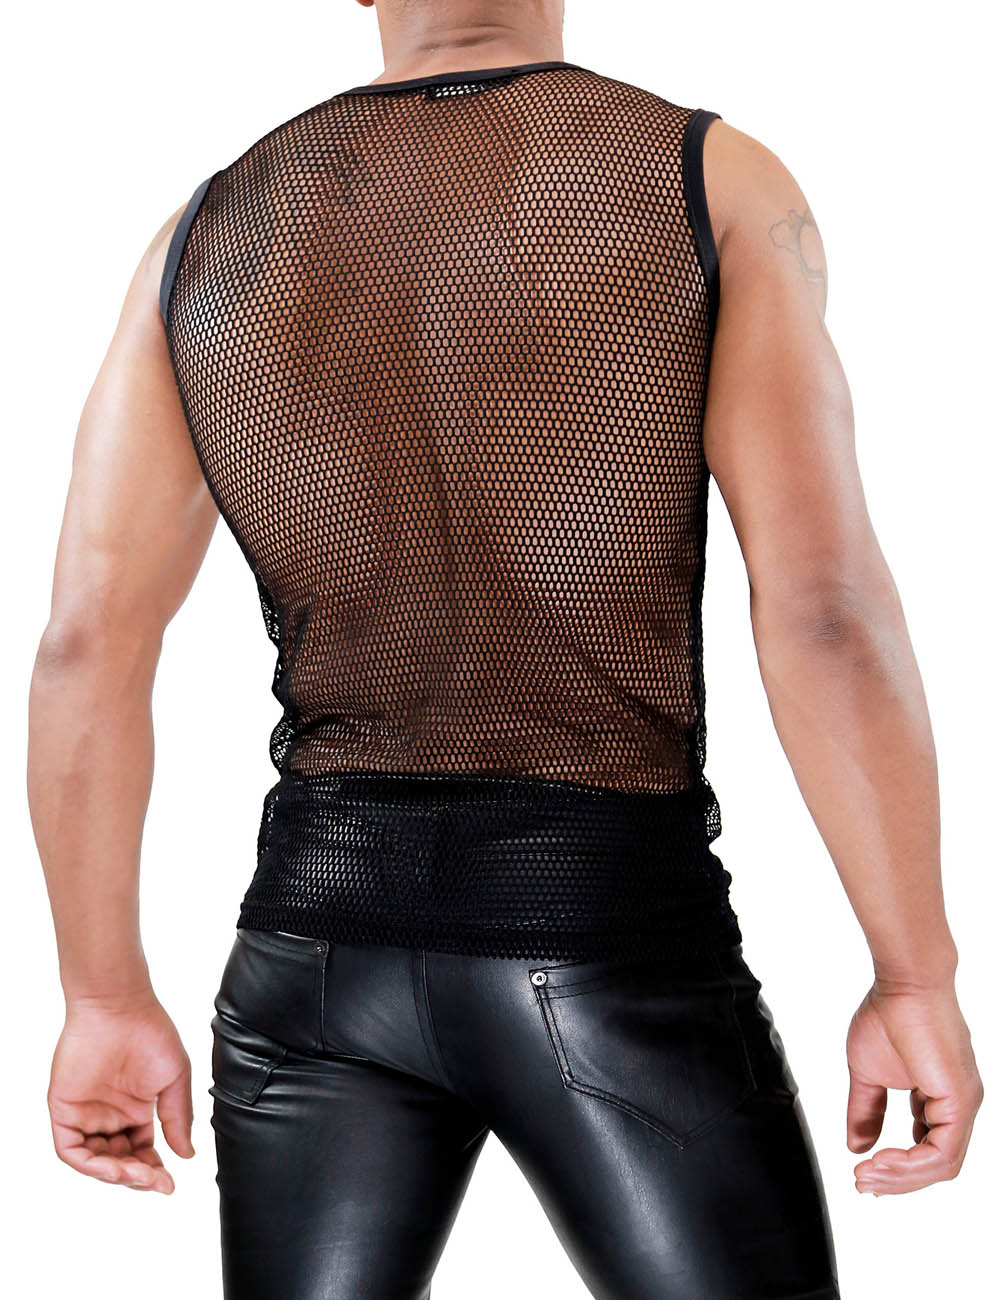 Spartagus fetish wear